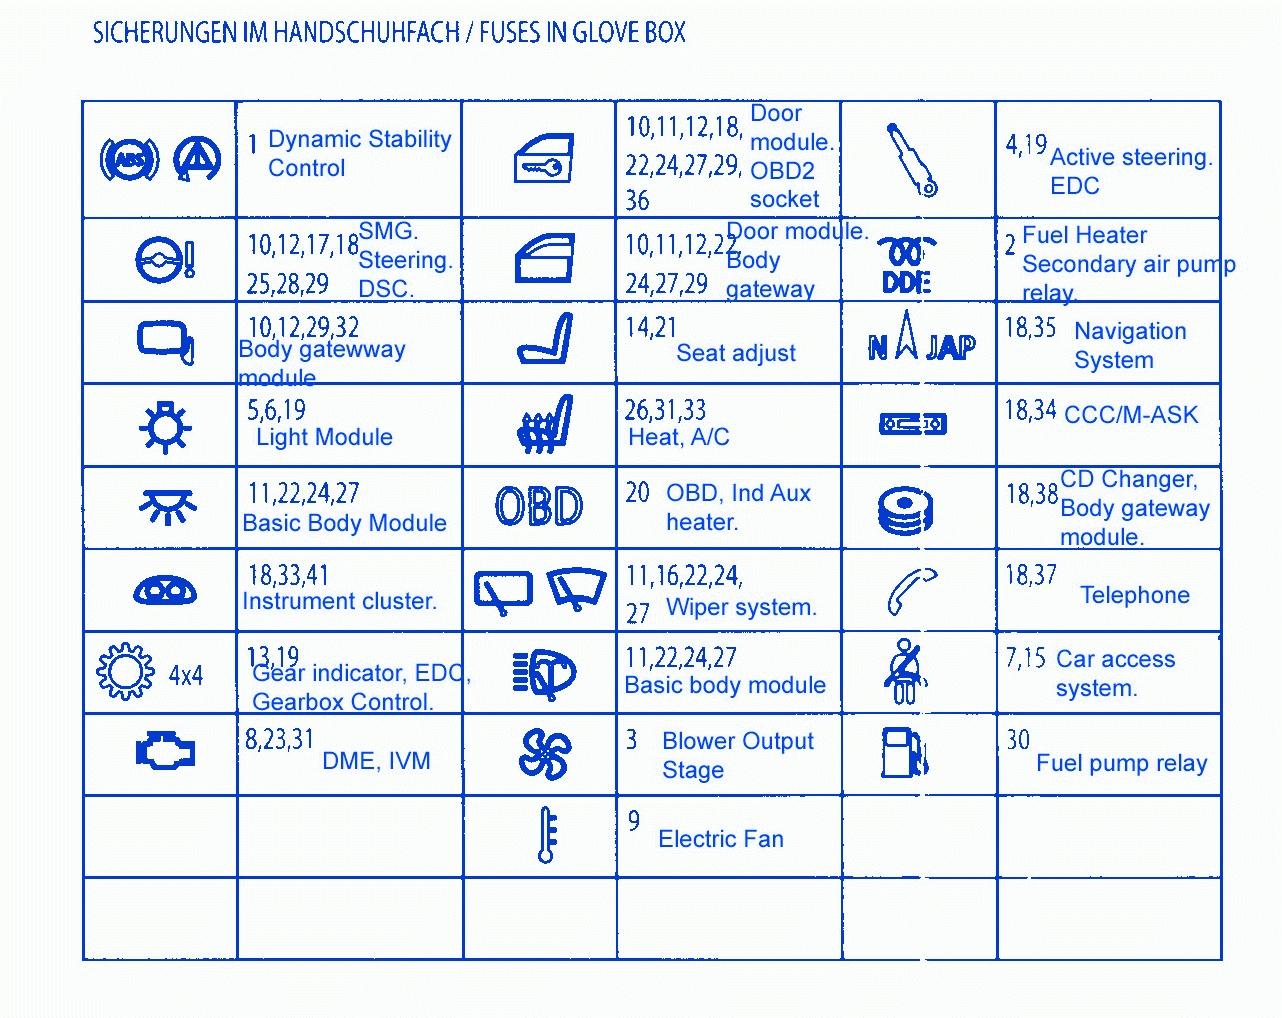 Vw Polo Fuse Box 2000 - Secure Wiring Diagram wires-bad -  wires-bad.sosanziani.itsosanziani.it